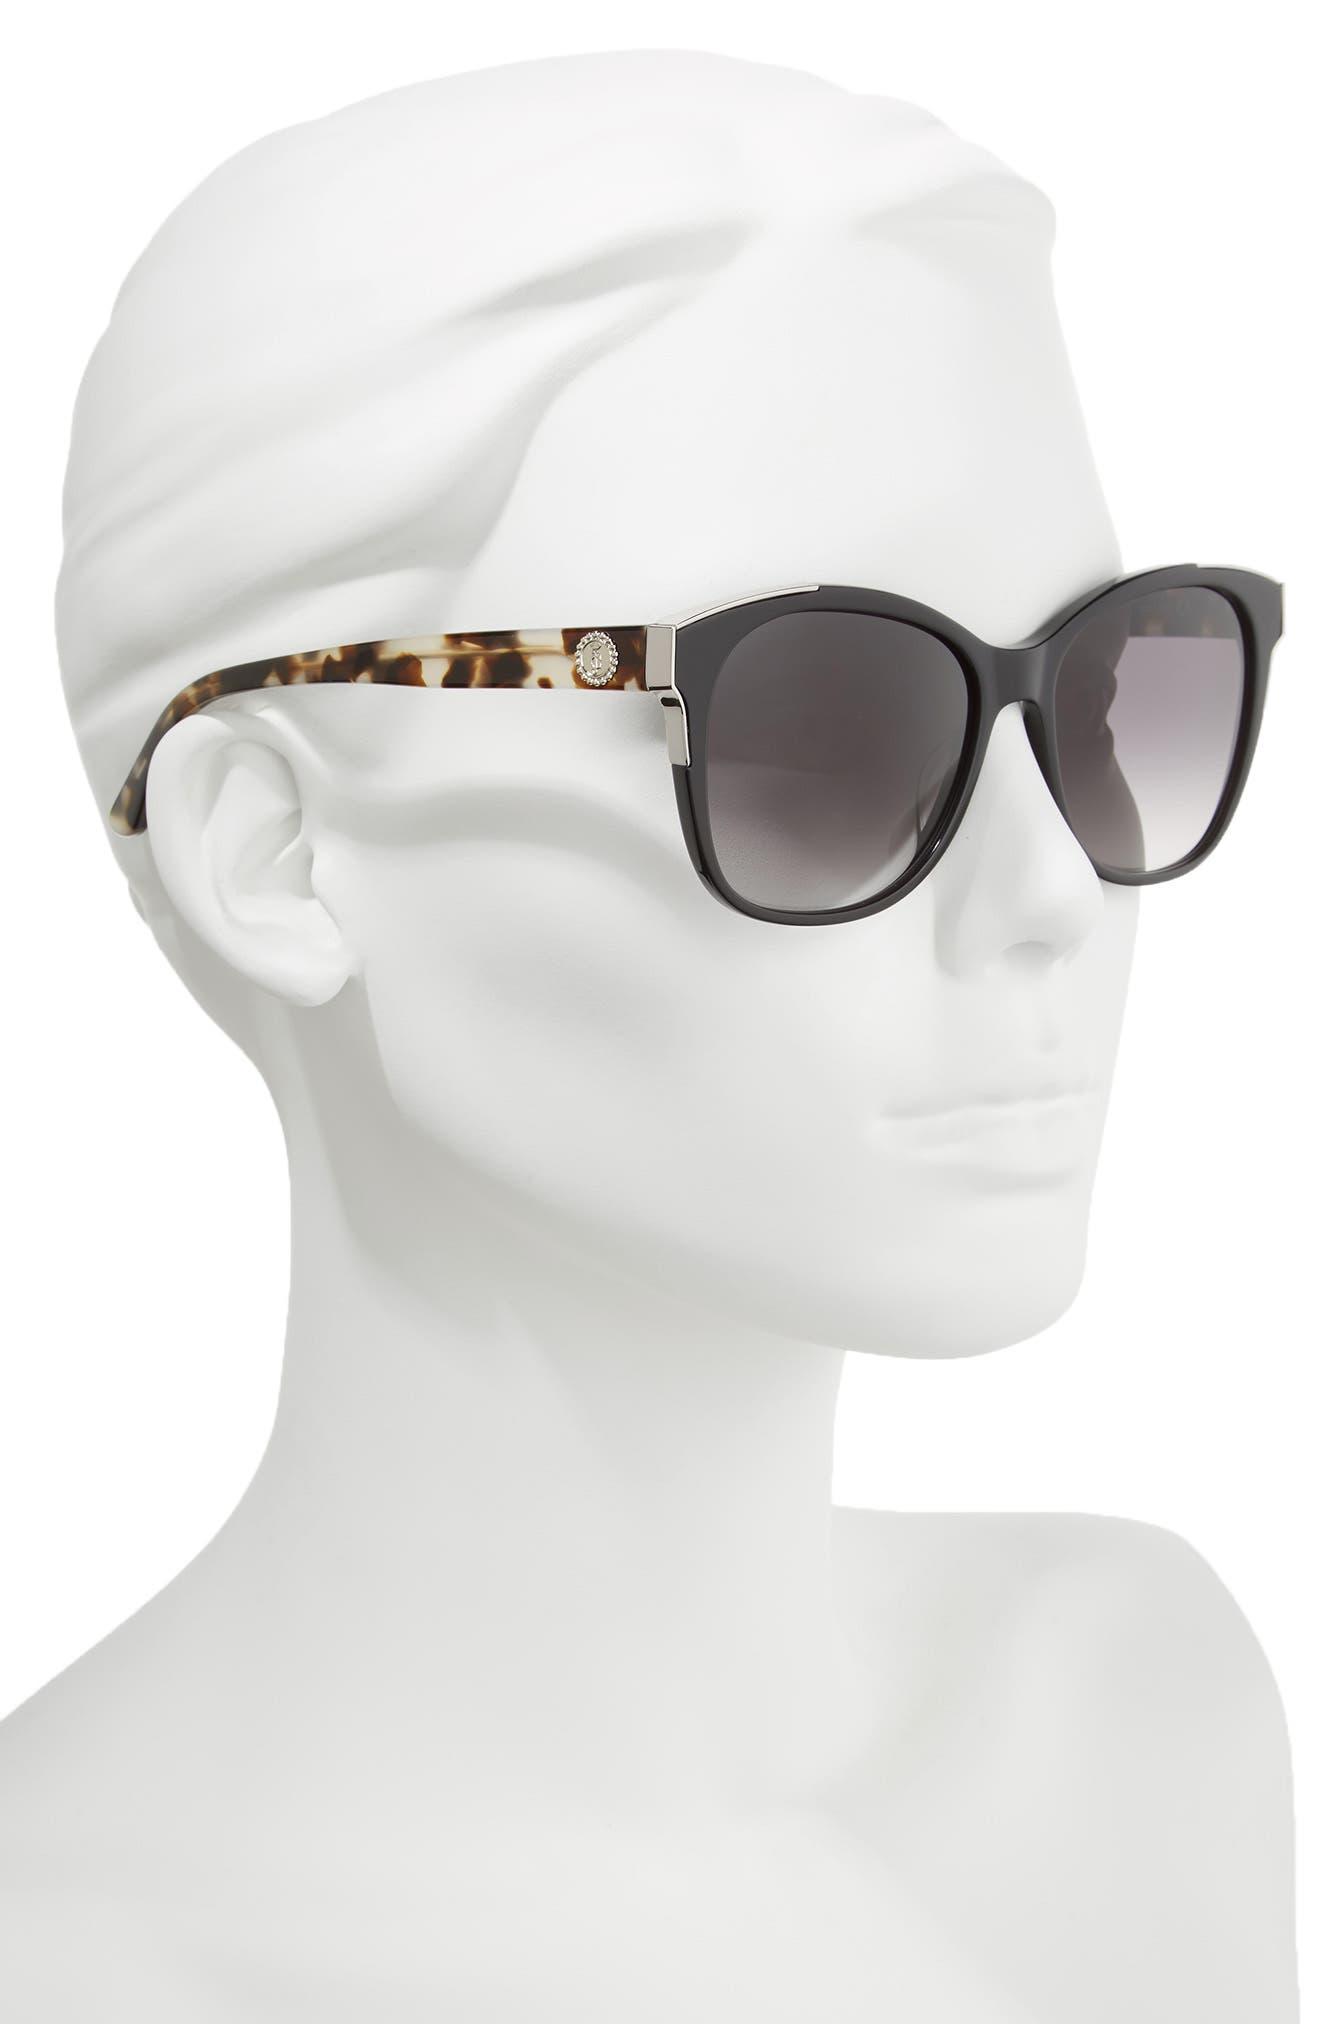 JUICY COUTURE, Black Label 56mm Cat Eye Sunglasses, Alternate thumbnail 2, color, 001